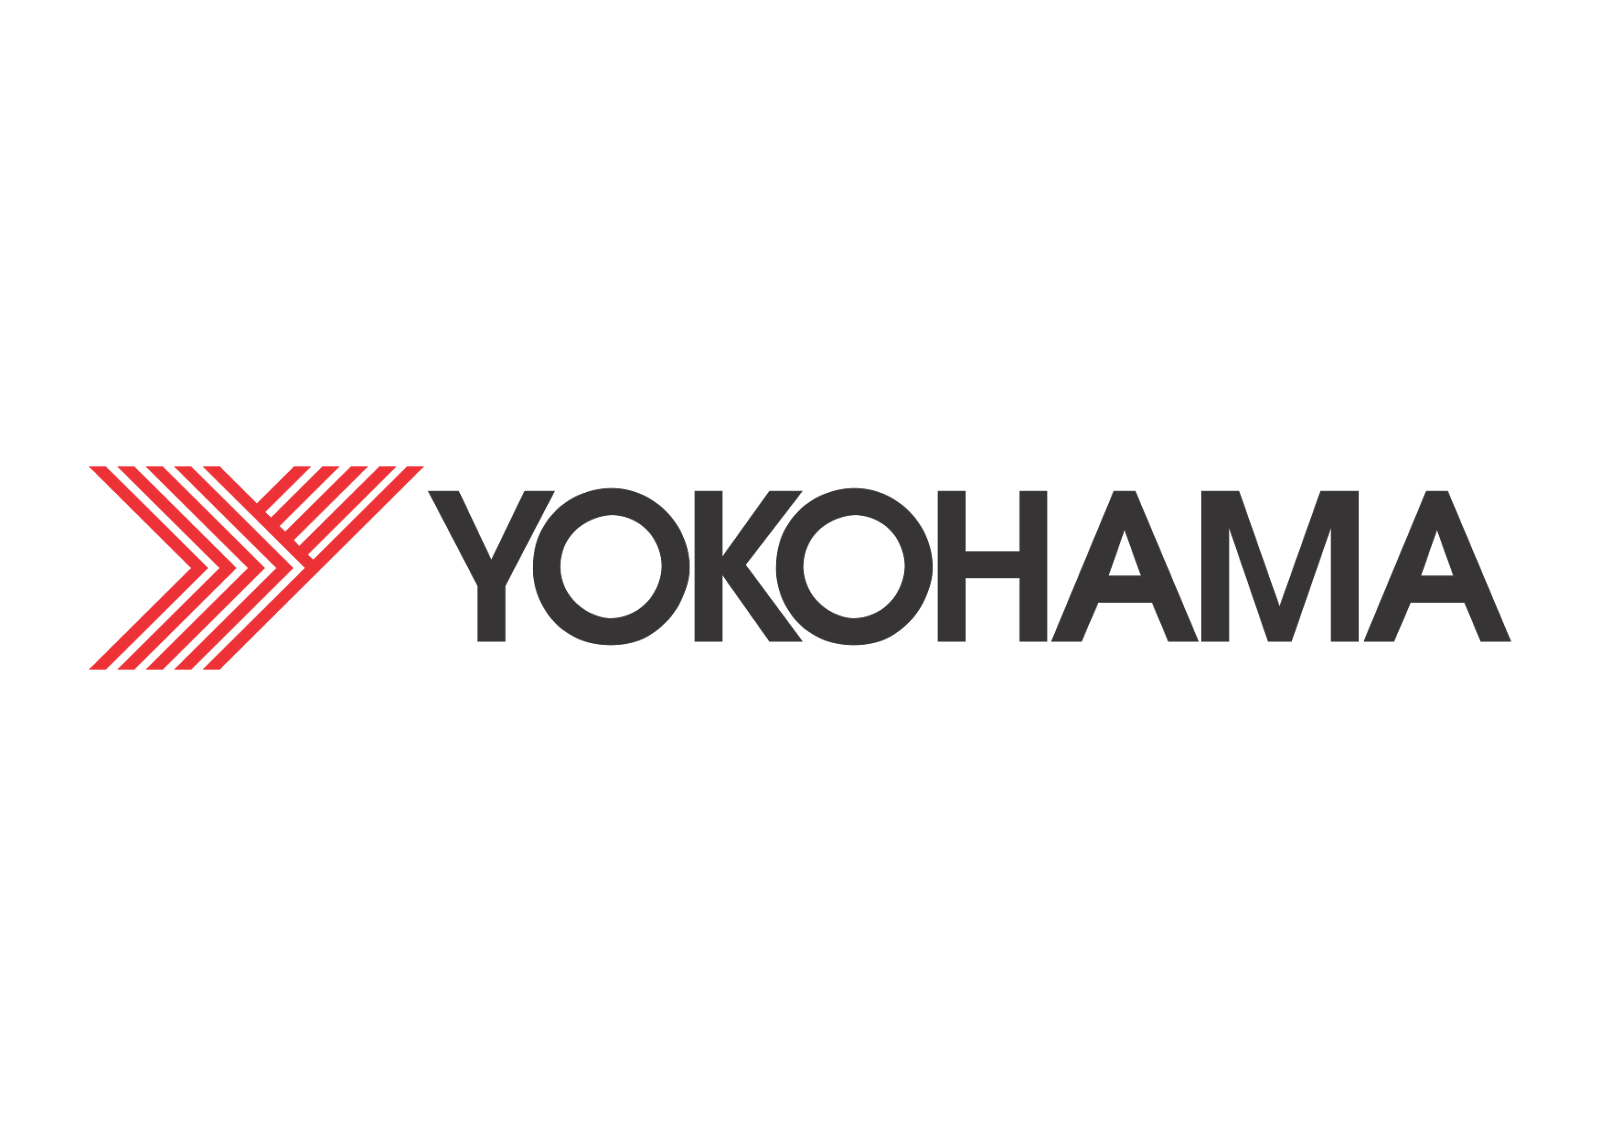 Yokohama Logo Vector (Tire manufacturing company)~ Format